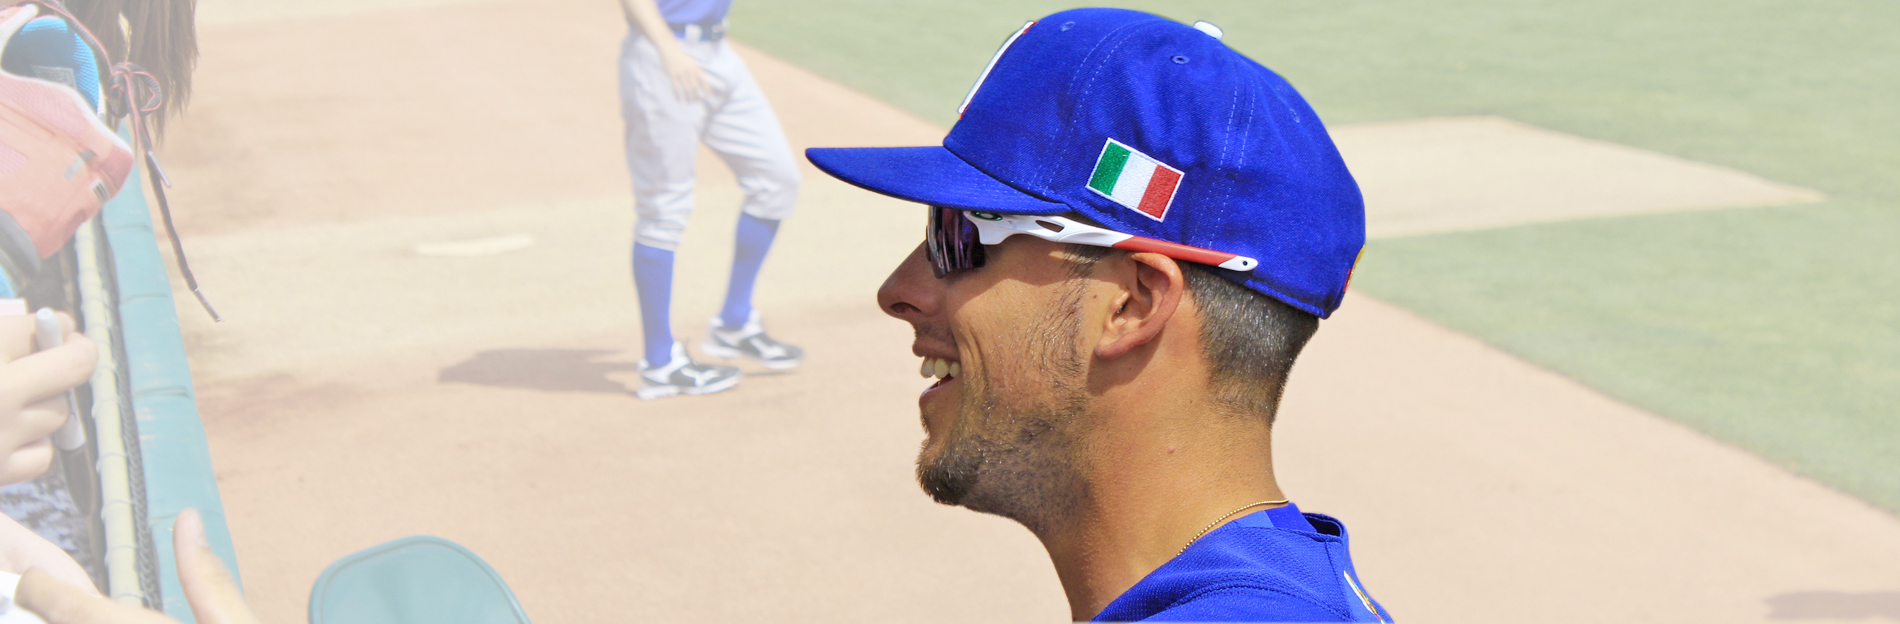 909d706eb13 Alex Liddi will have no trouble wearing Dodger blue (Photo by Nicolo  Balzani).